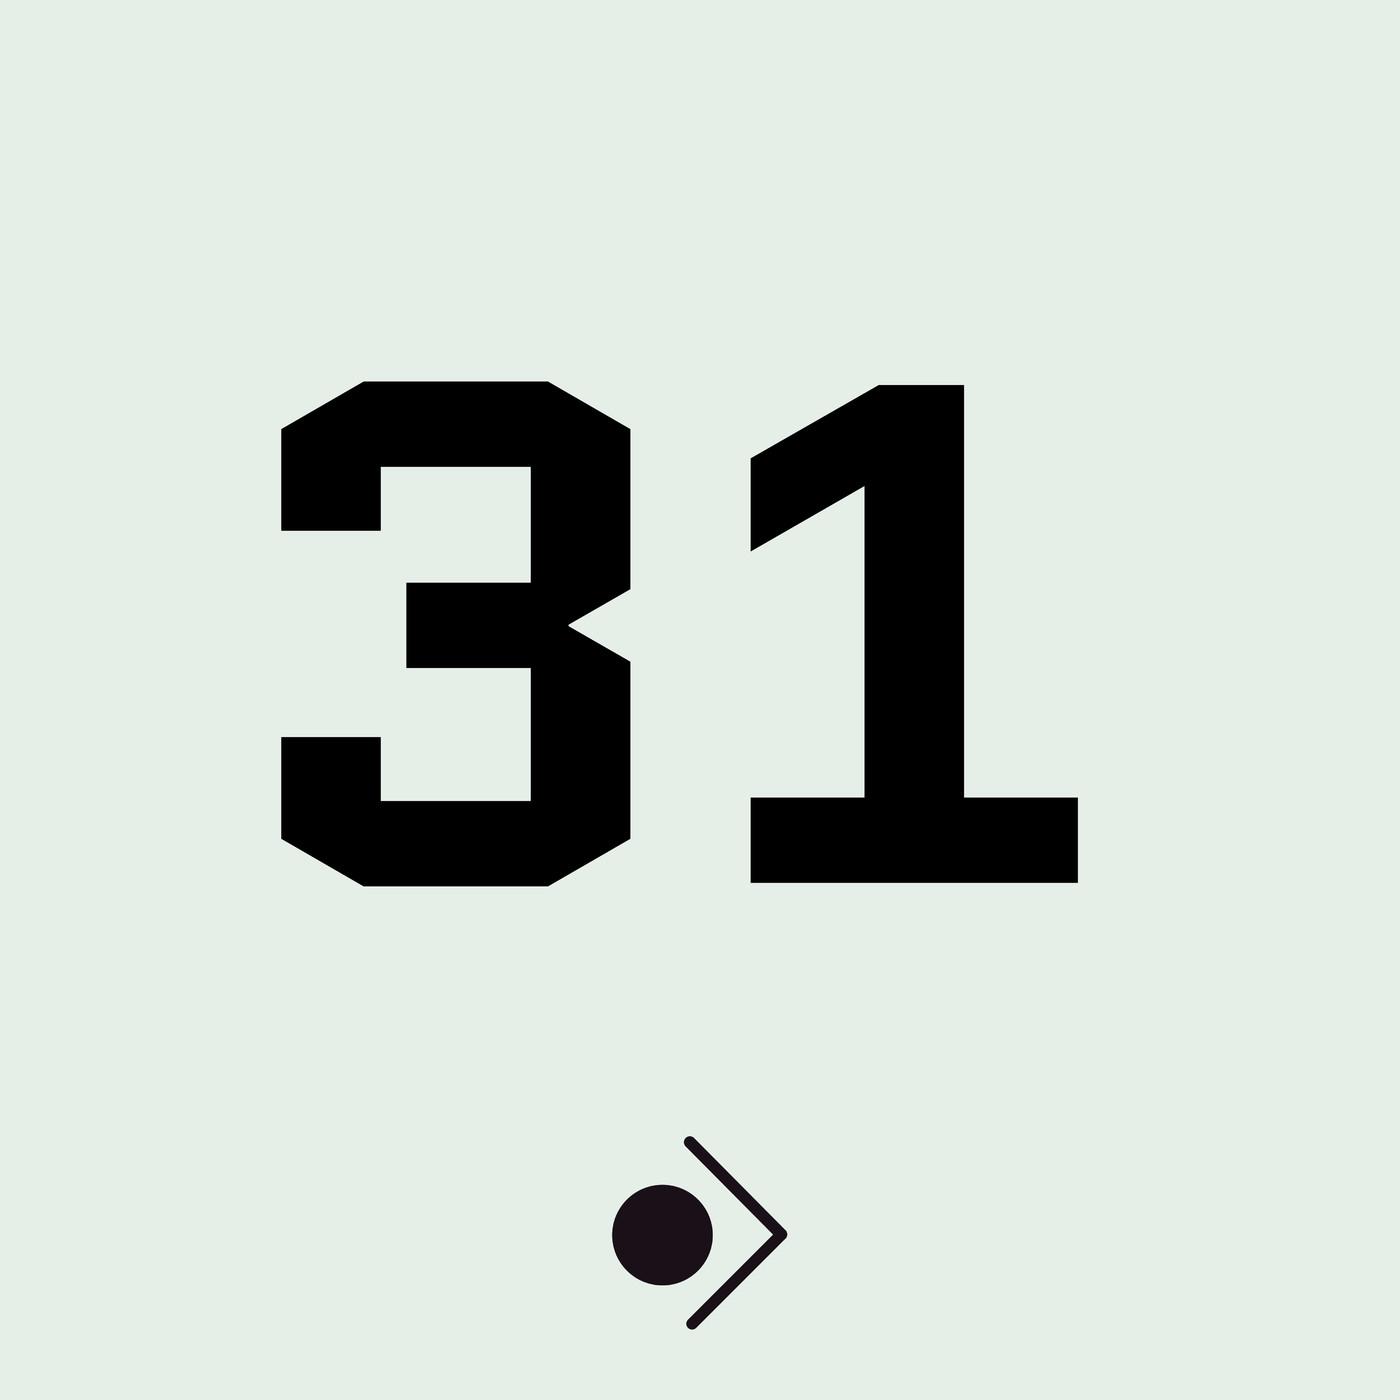 031 - El carril minimoy